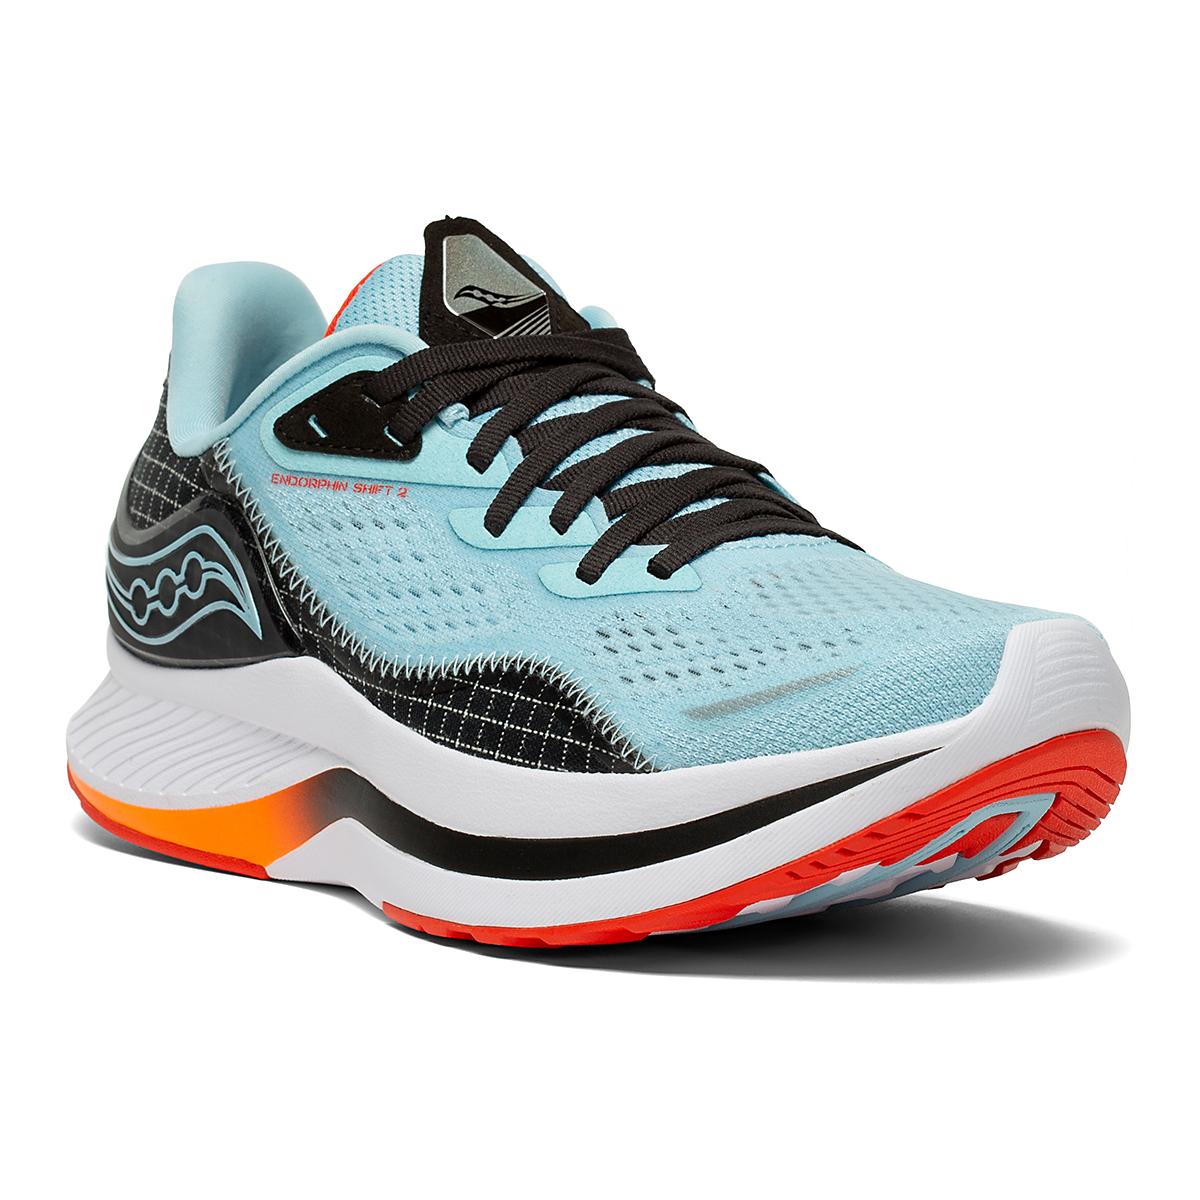 Women's Saucony Endorphin Shift 2 Running Shoe - Color: Powder/Scarlet - Size: 5 - Width: Regular, Powder/Scarlet, large, image 5